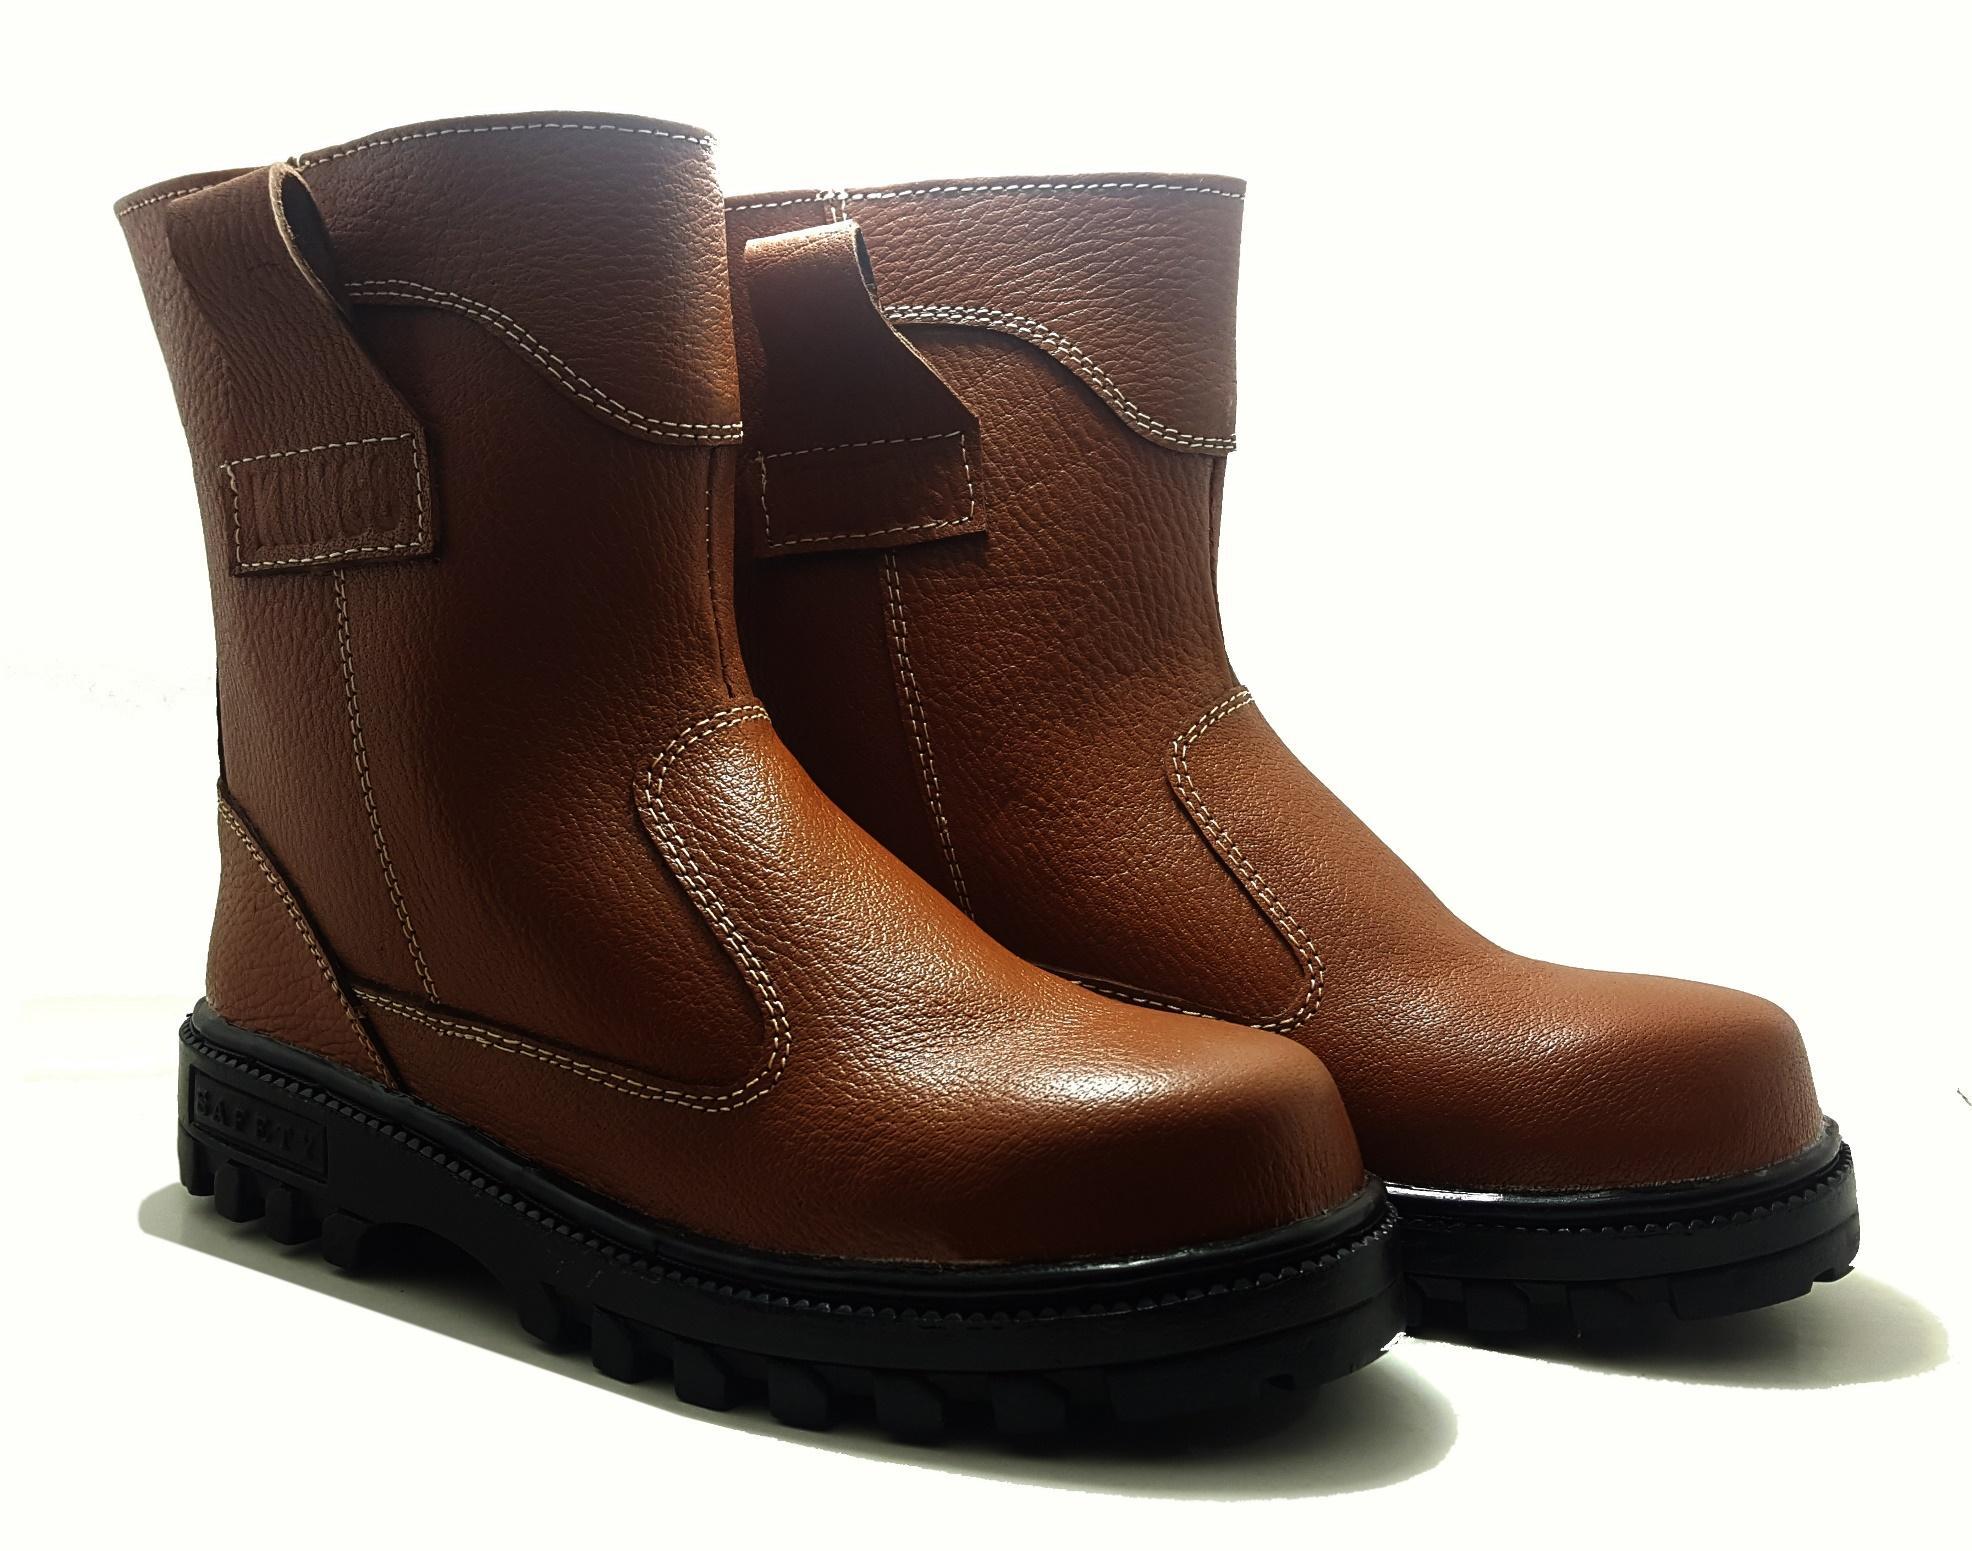 Sepatu Boots Safety Asli Kulit King Arthur d967485195